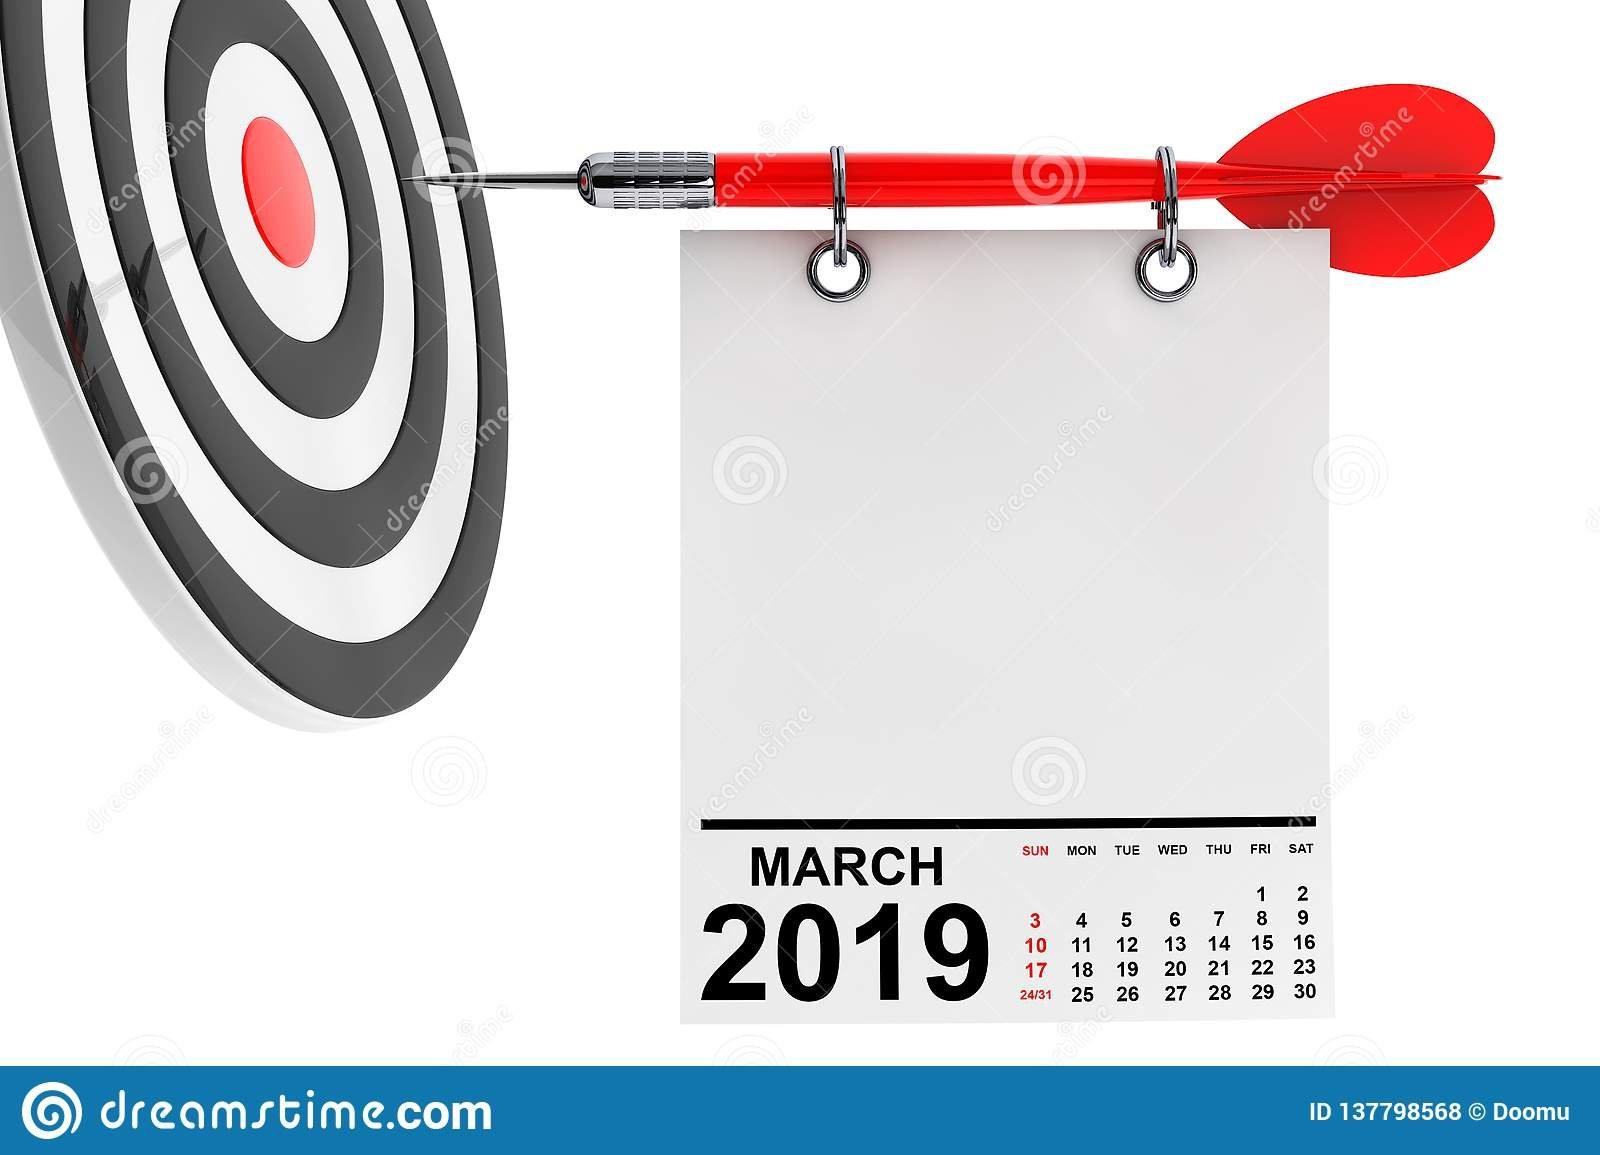 Calendar March 2019 With Target. 3D Rendering Stock Illustration Calendar 2019 At Target